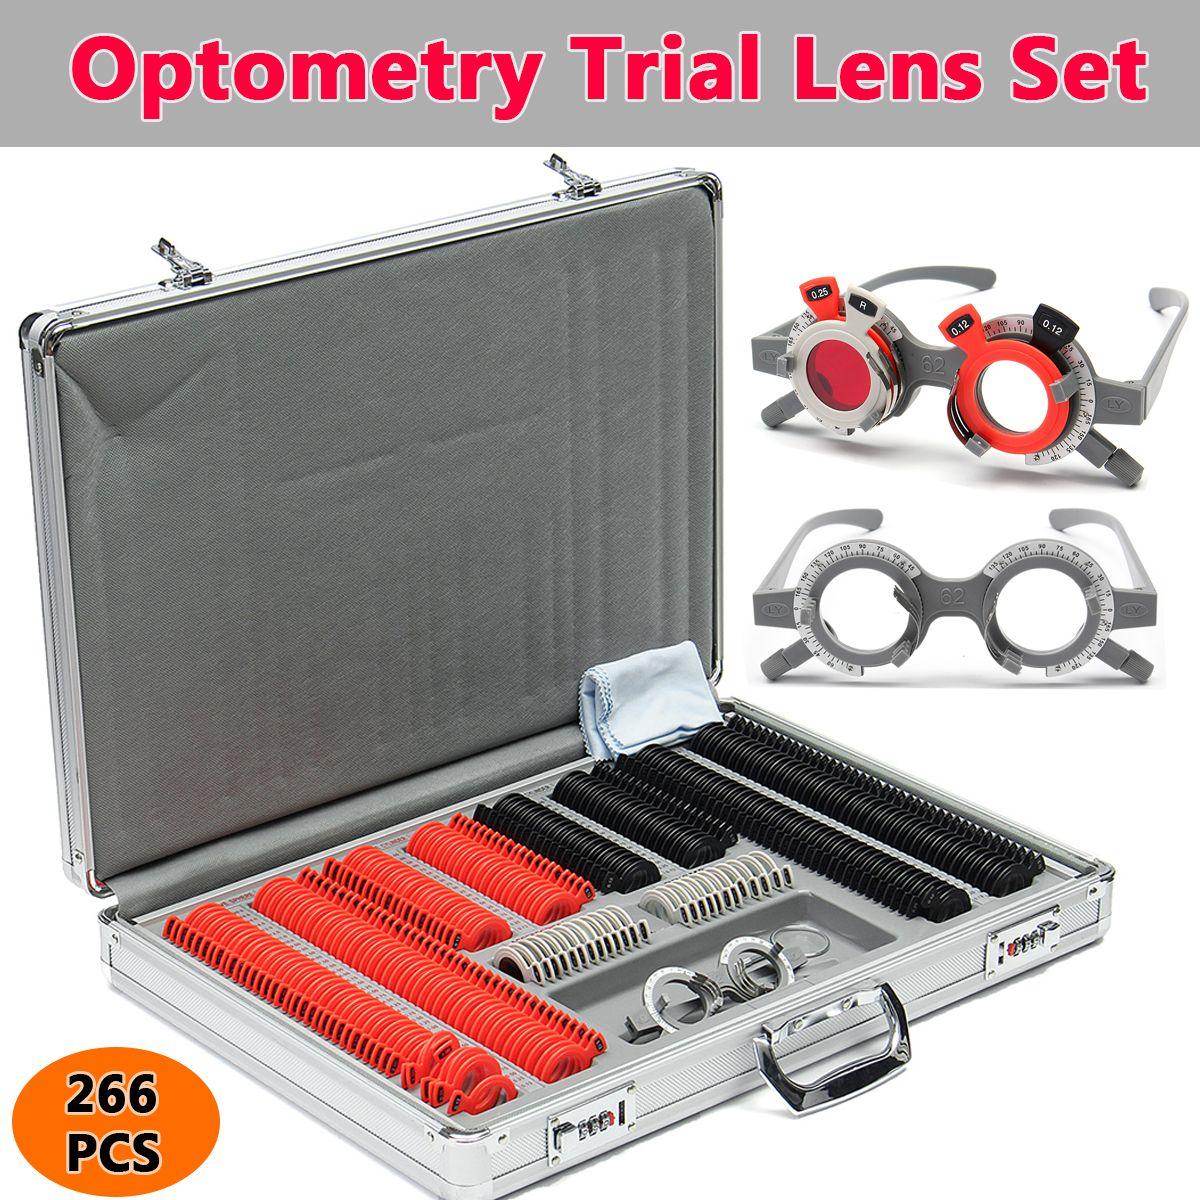 266 Pcs Trial Lens Set Optical Lens Optometry Rim Case Evidence Box Aluminum Rim Kit Optometry Test Trial Frame